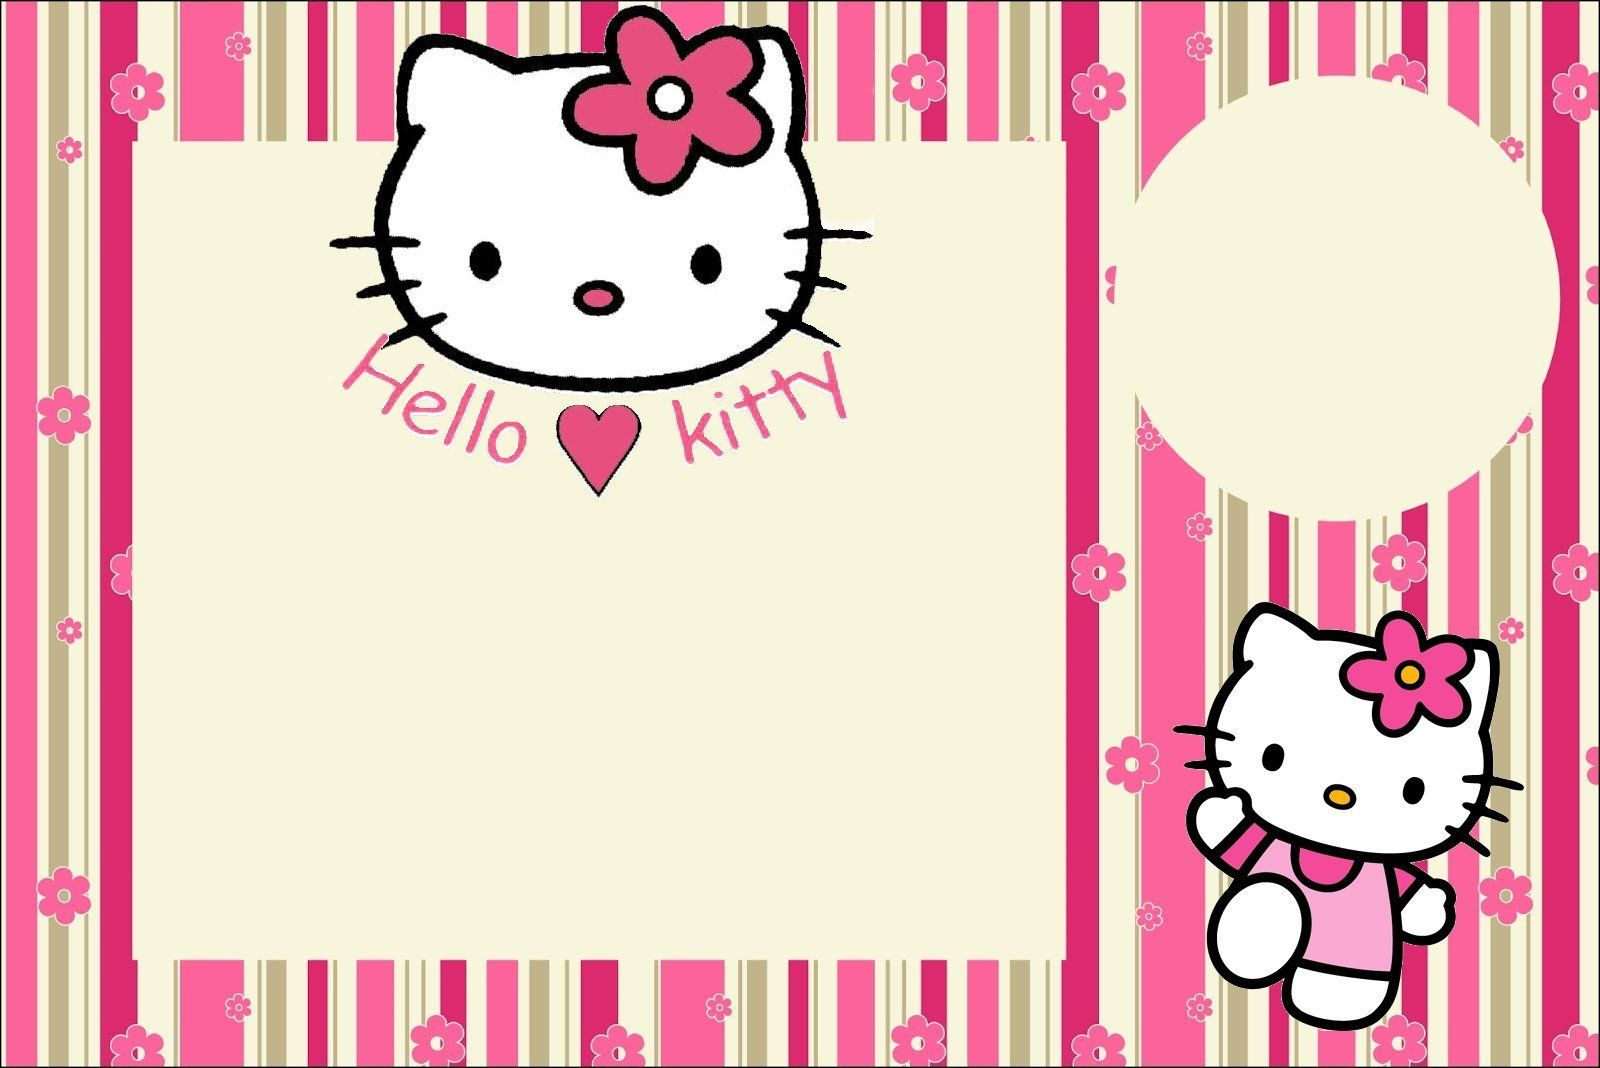 Hello Kitty Invitation Template Hello Kitty Invitations Hello Kitty Printables Hello Kitty Birthday Invitations